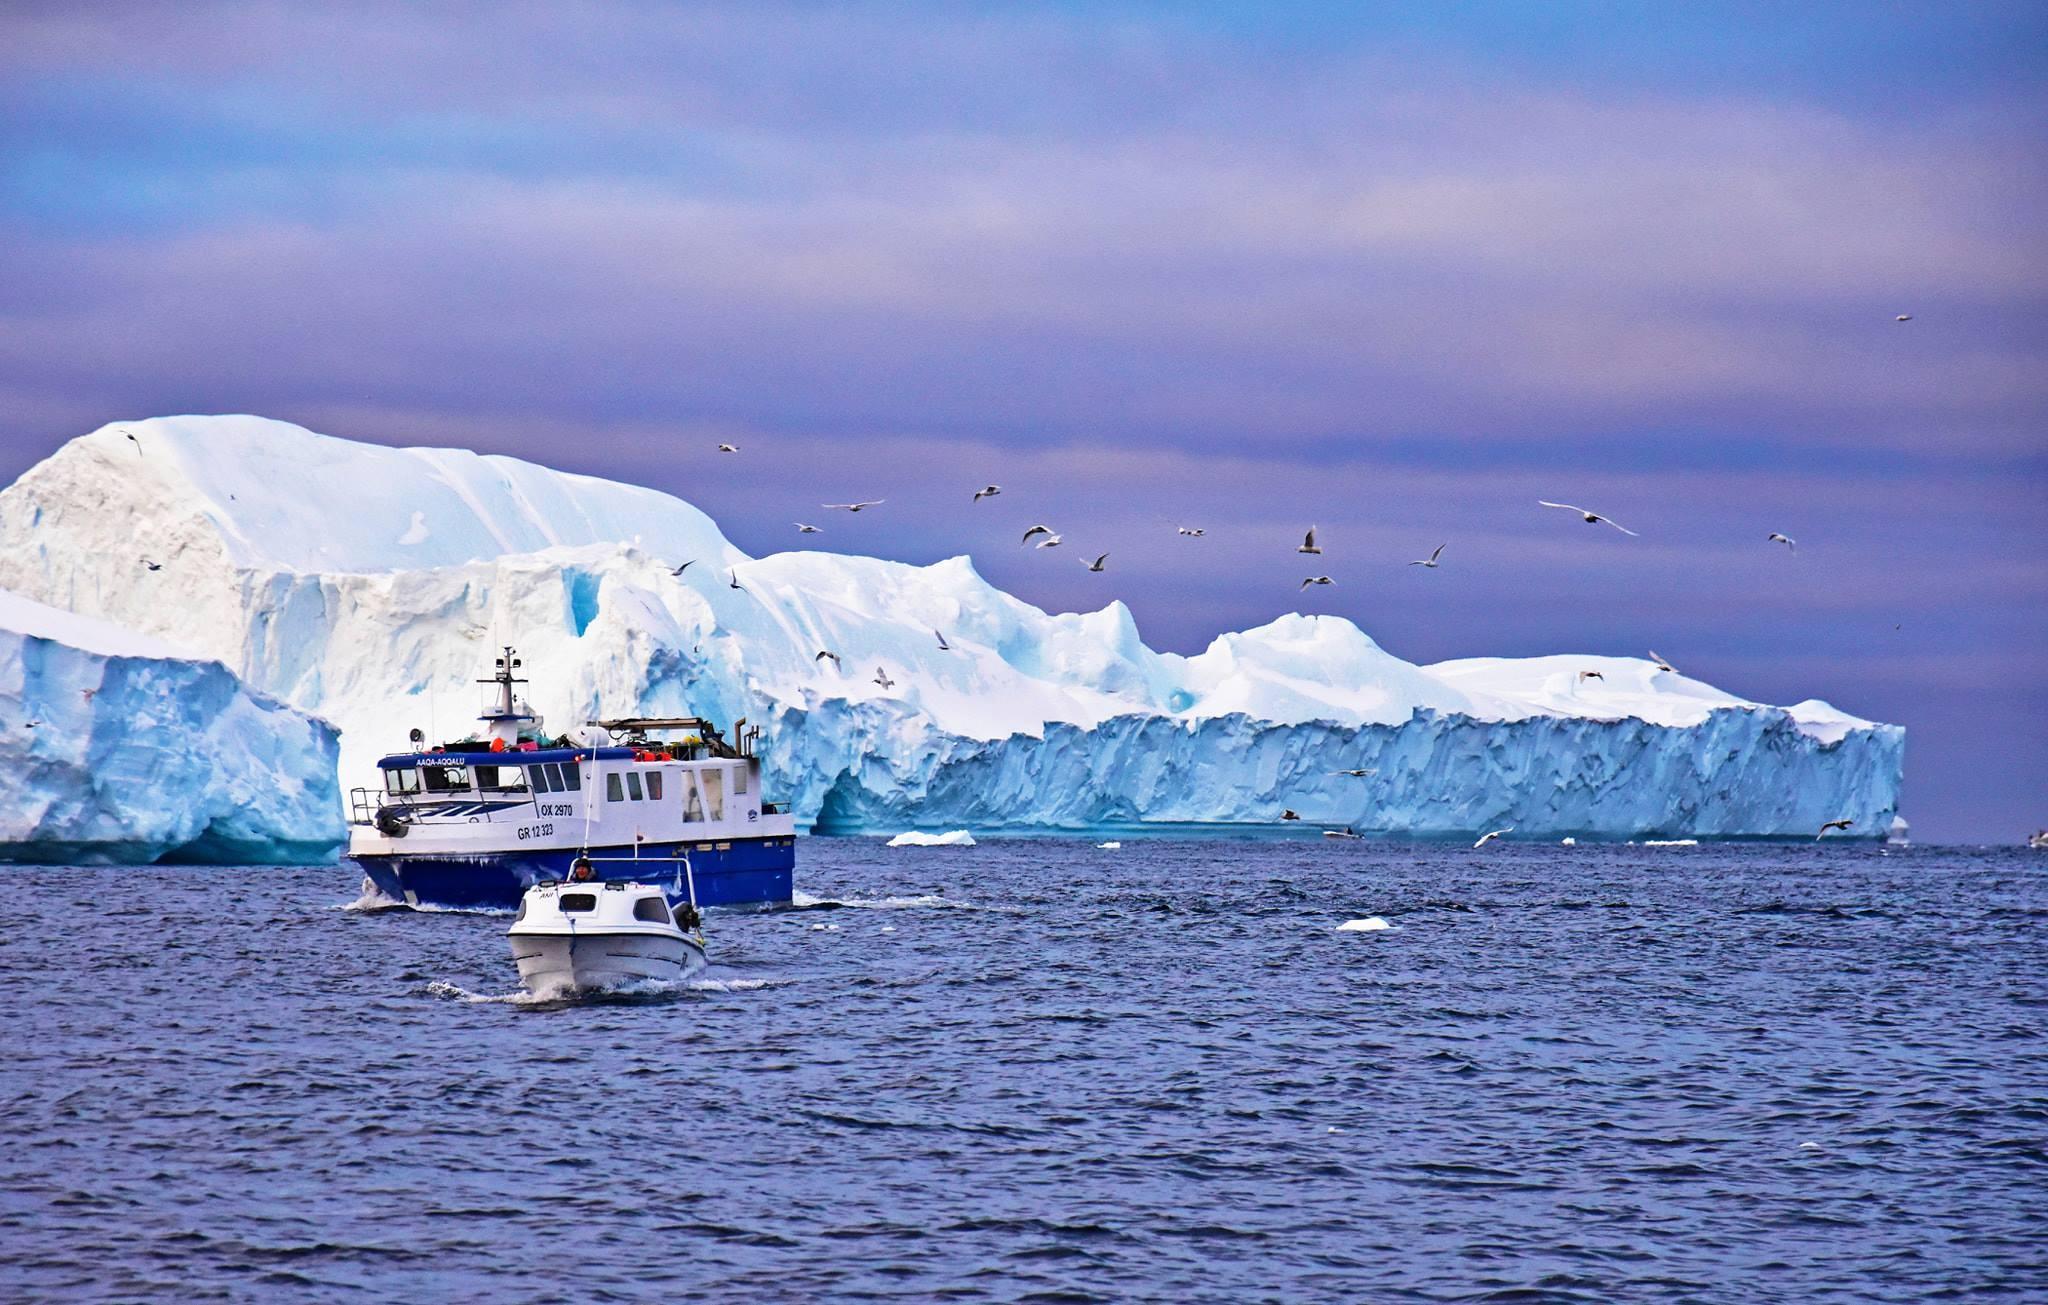 Cau chuyen Greenland va vung dat cuc Bac bi lang quen hinh anh 49